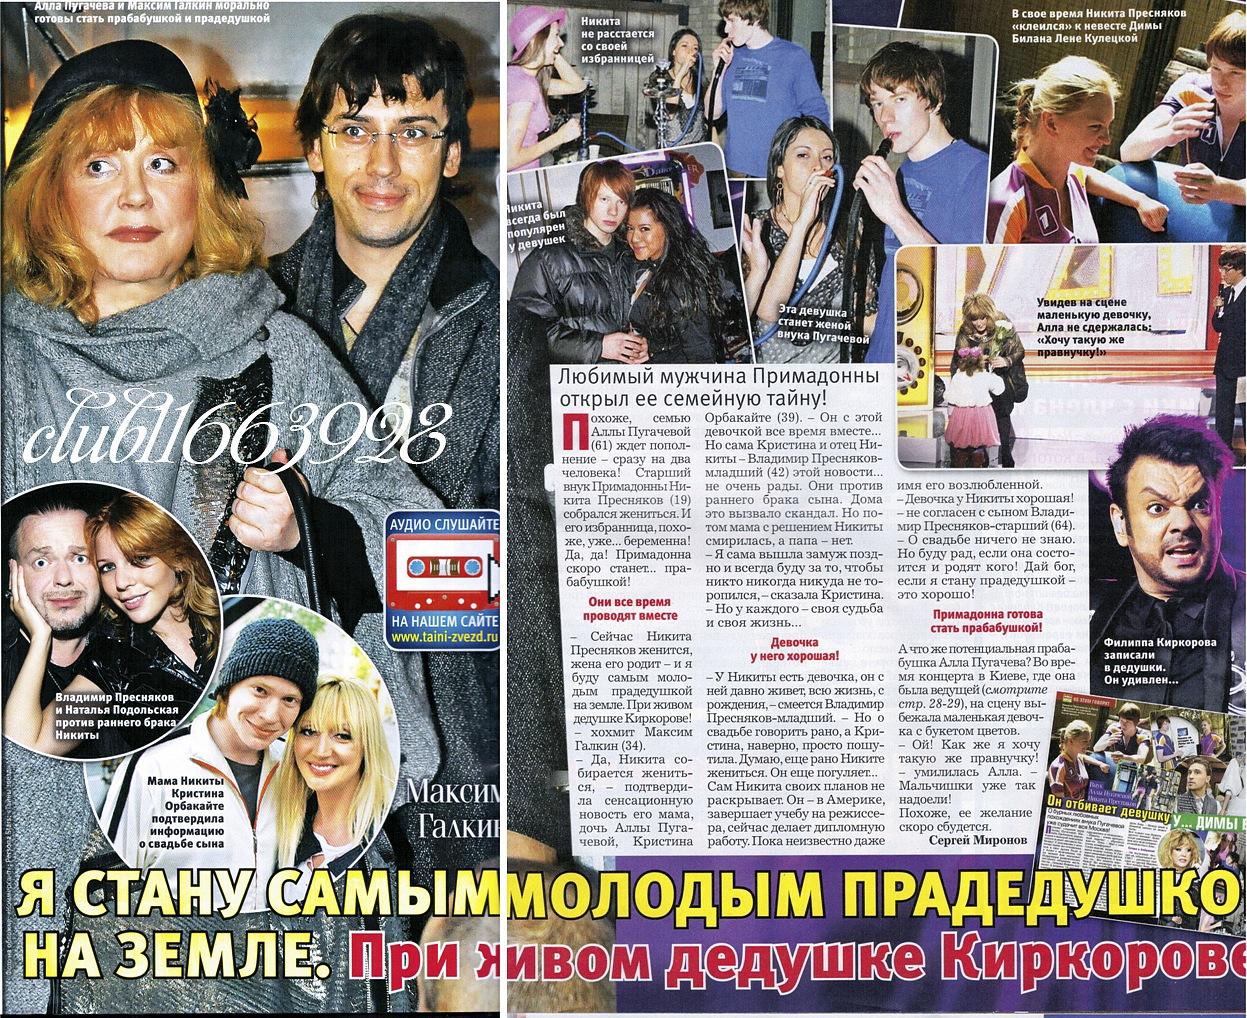 http://s5.uploads.ru/gZRYj.jpg